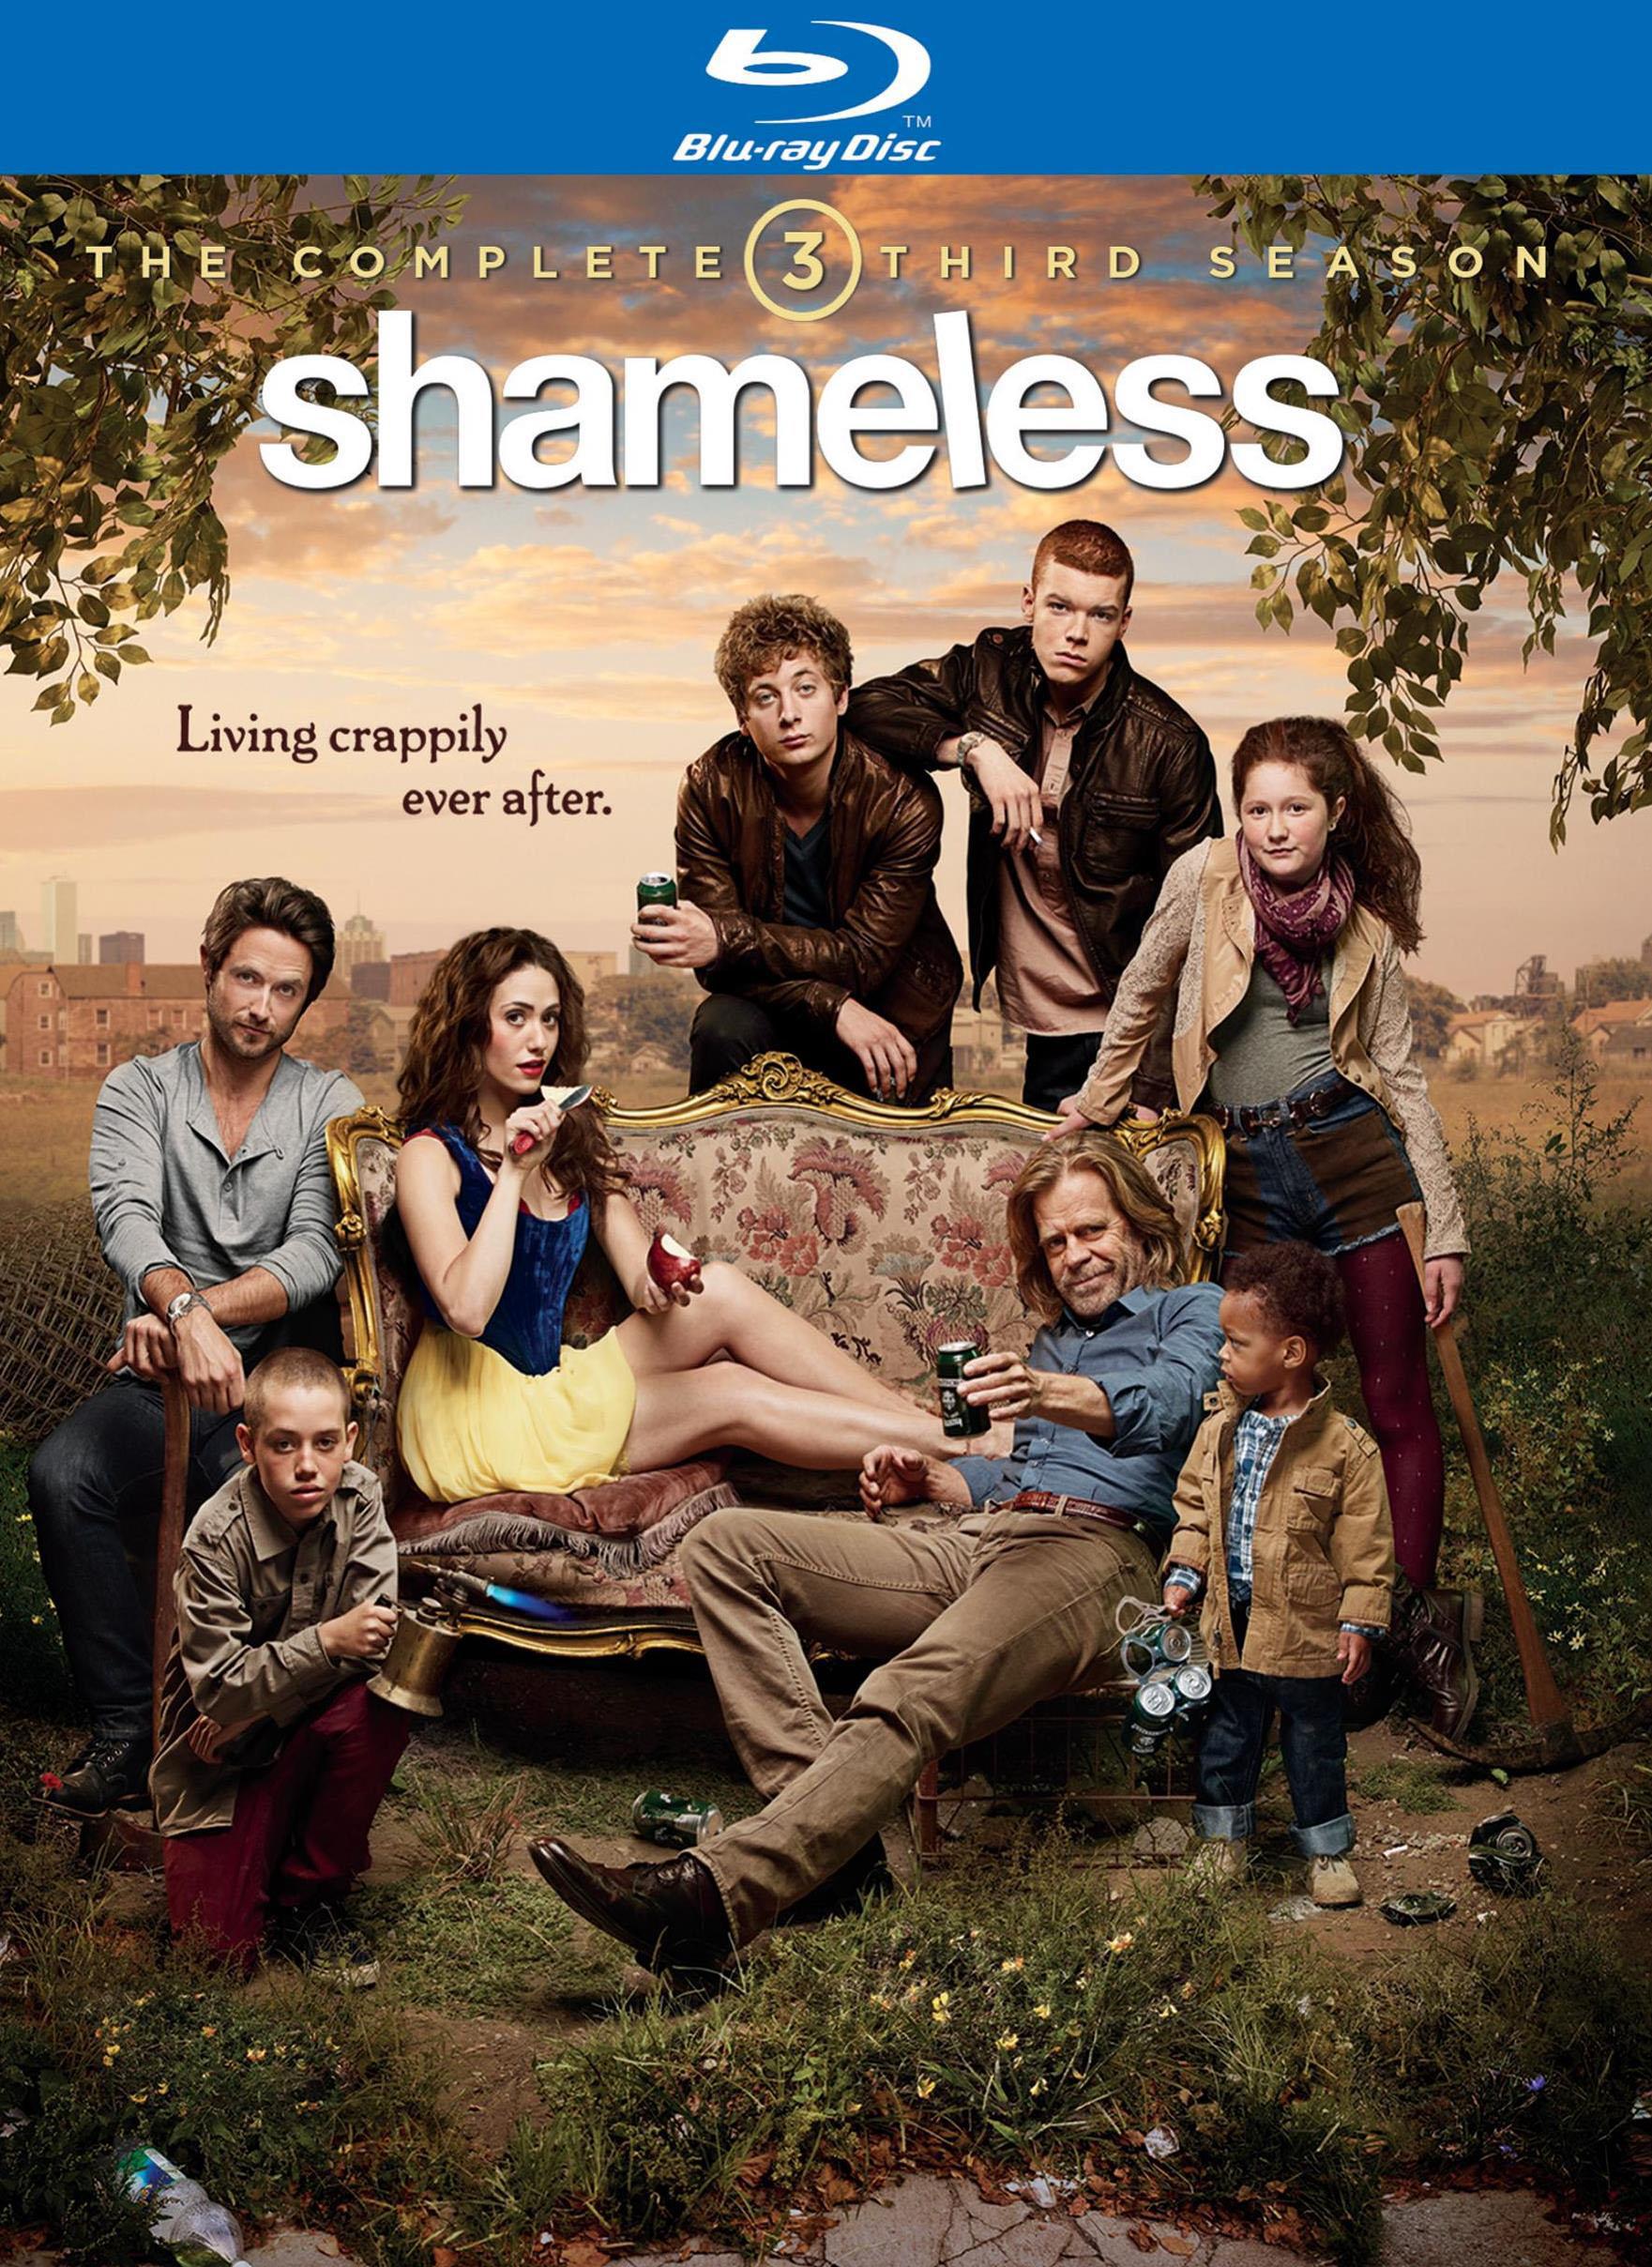 Shameless: The Complete Third Season [2 Discs] [blu-ray] 5836623